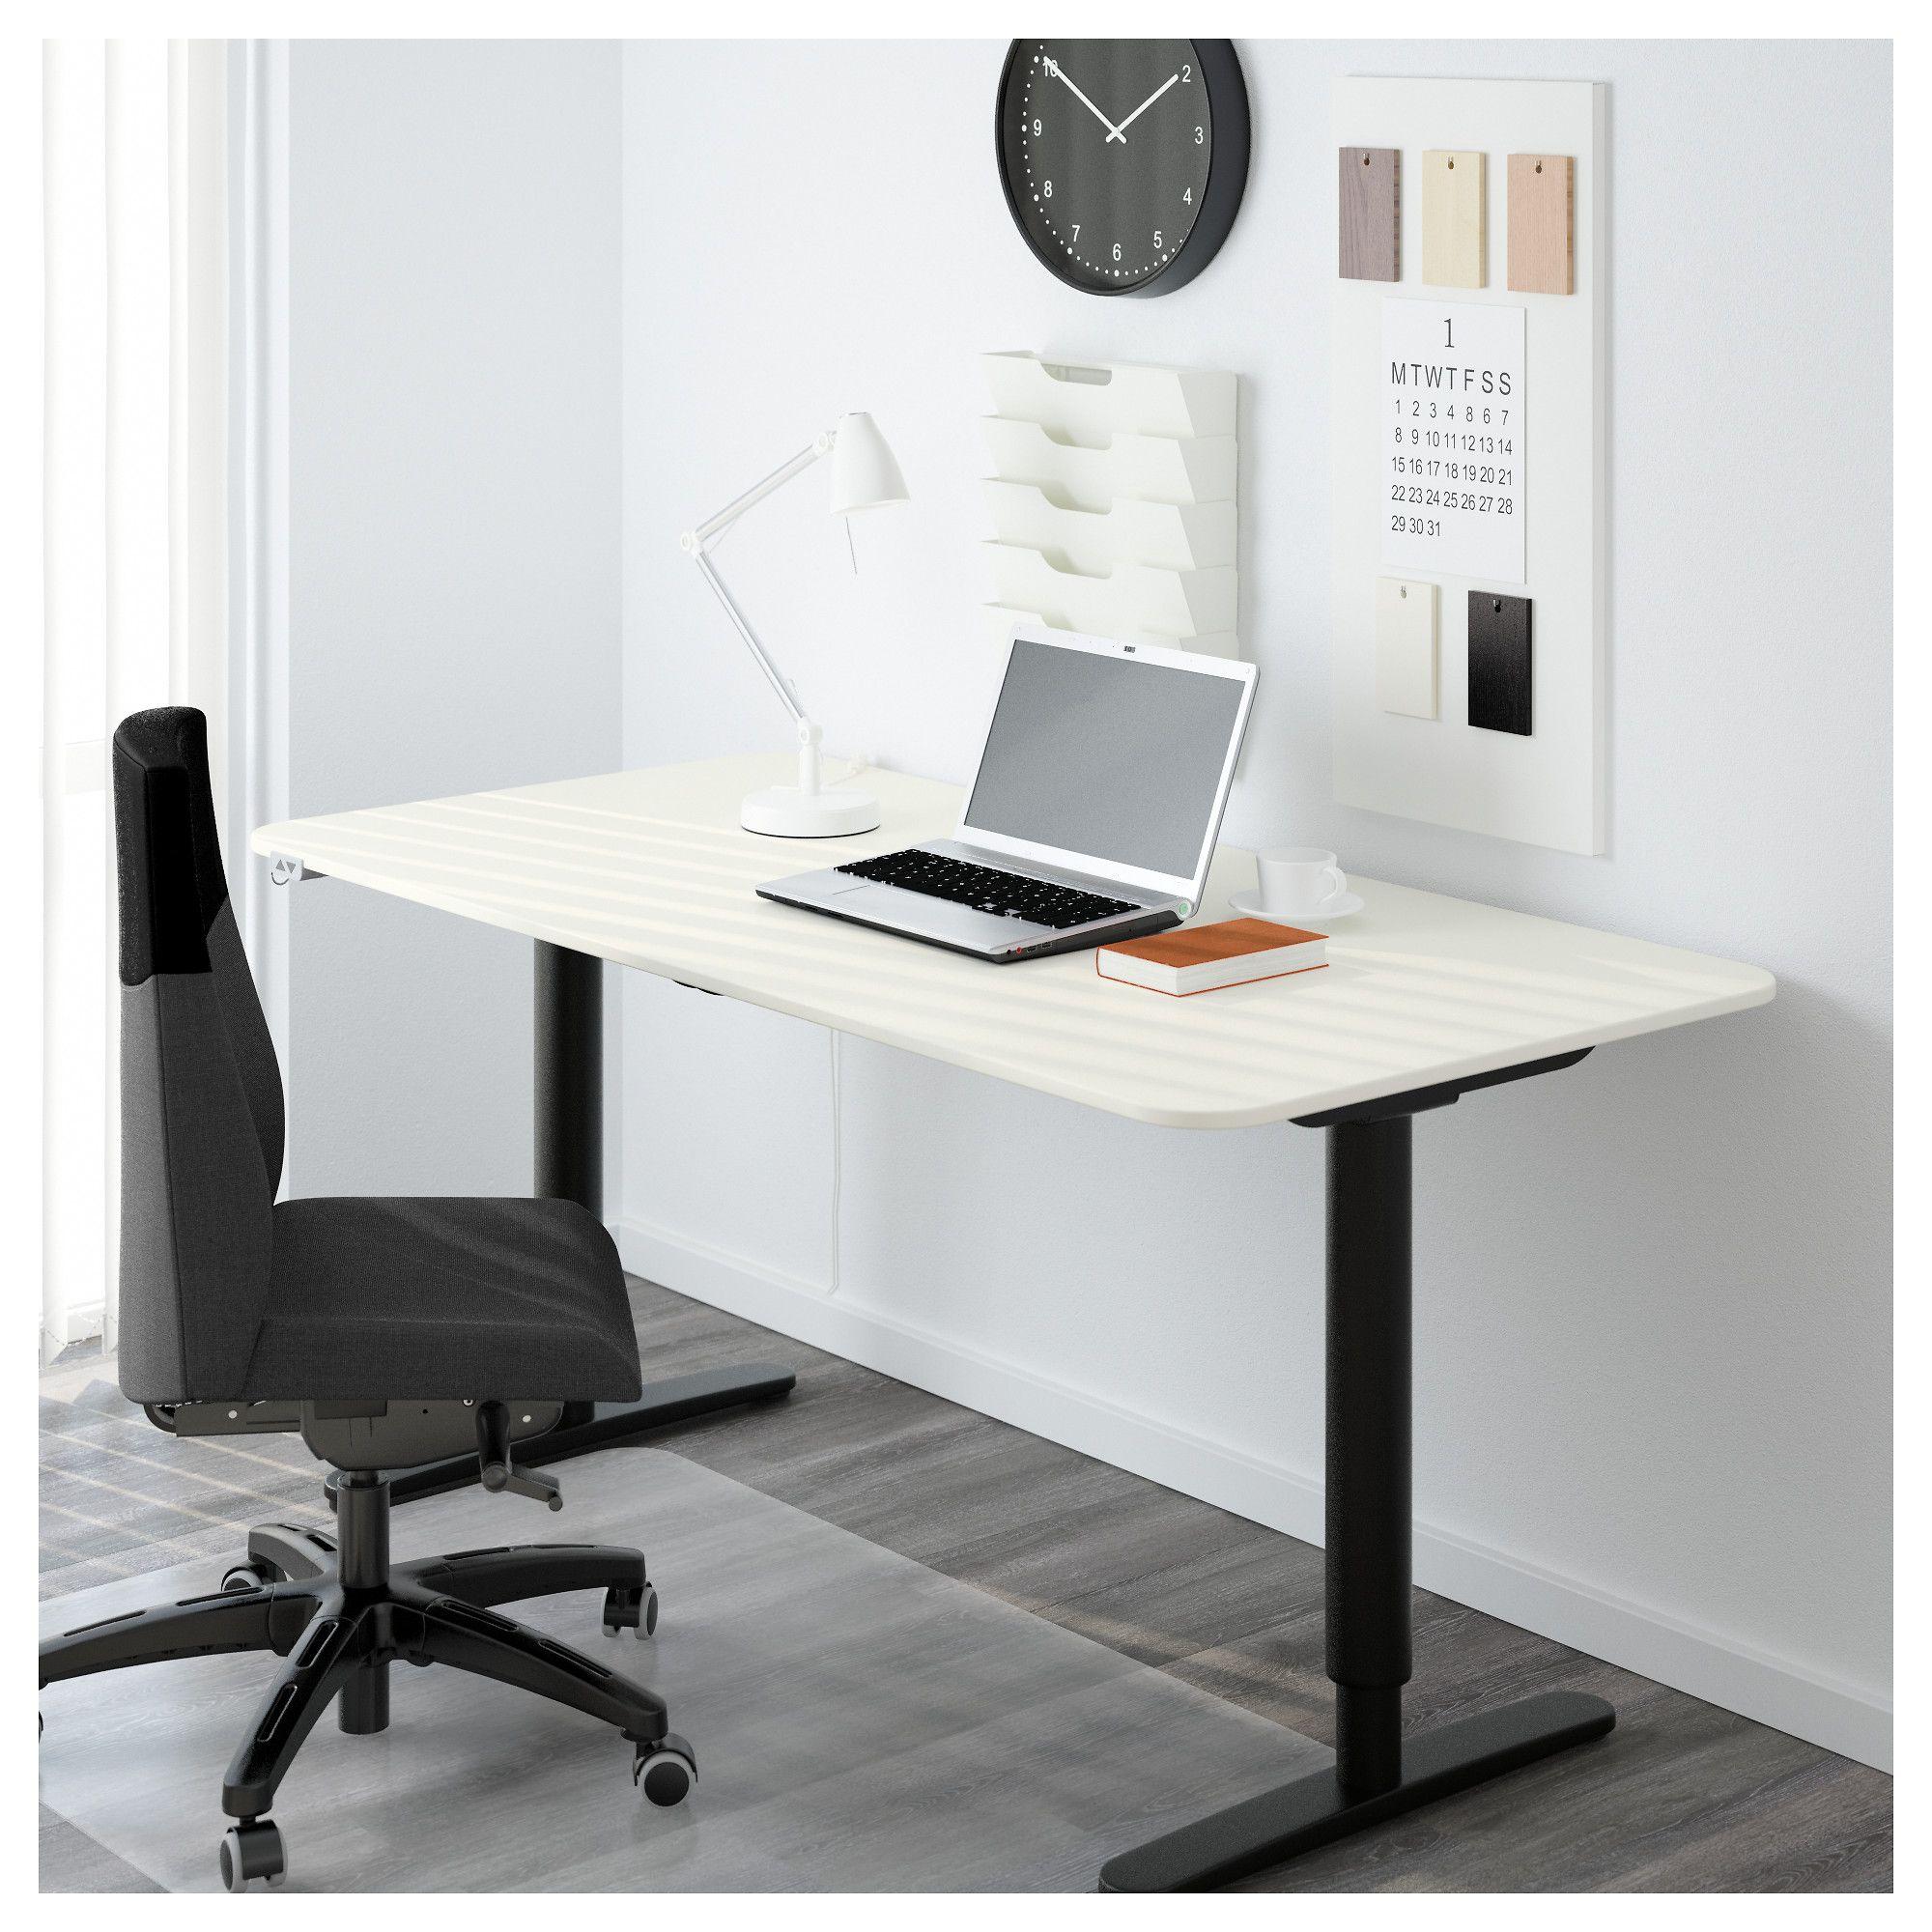 Bekant Tabletop White Ikea Canada Ikea Ikea Bekant Ikea Bekant Desk Ikea